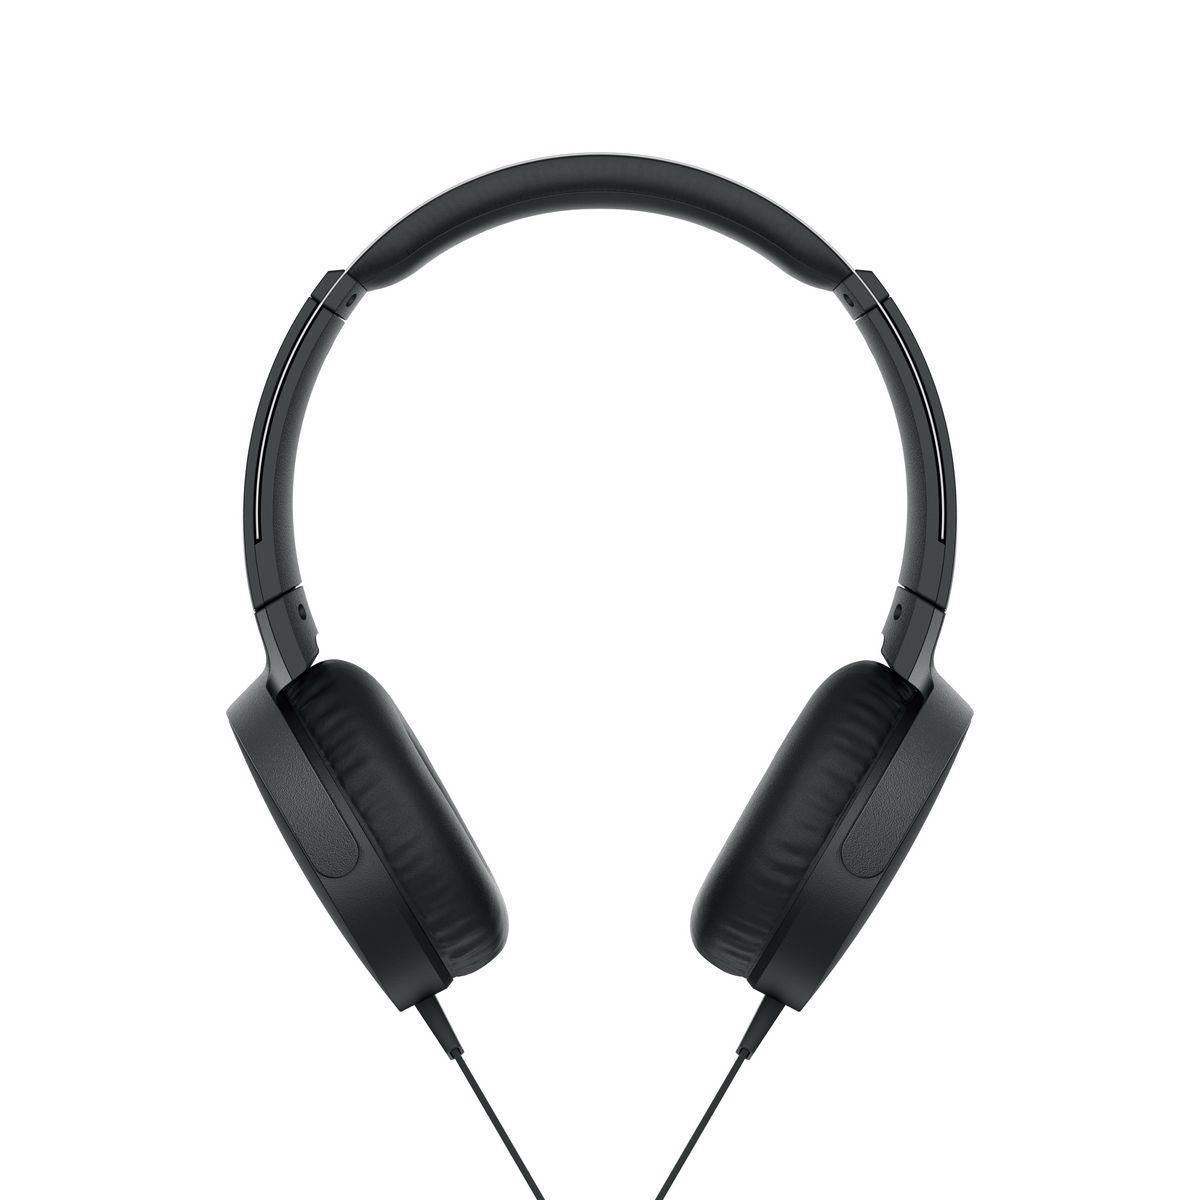 MDR-XB550AP Extra Bass - Noir - Casque audio